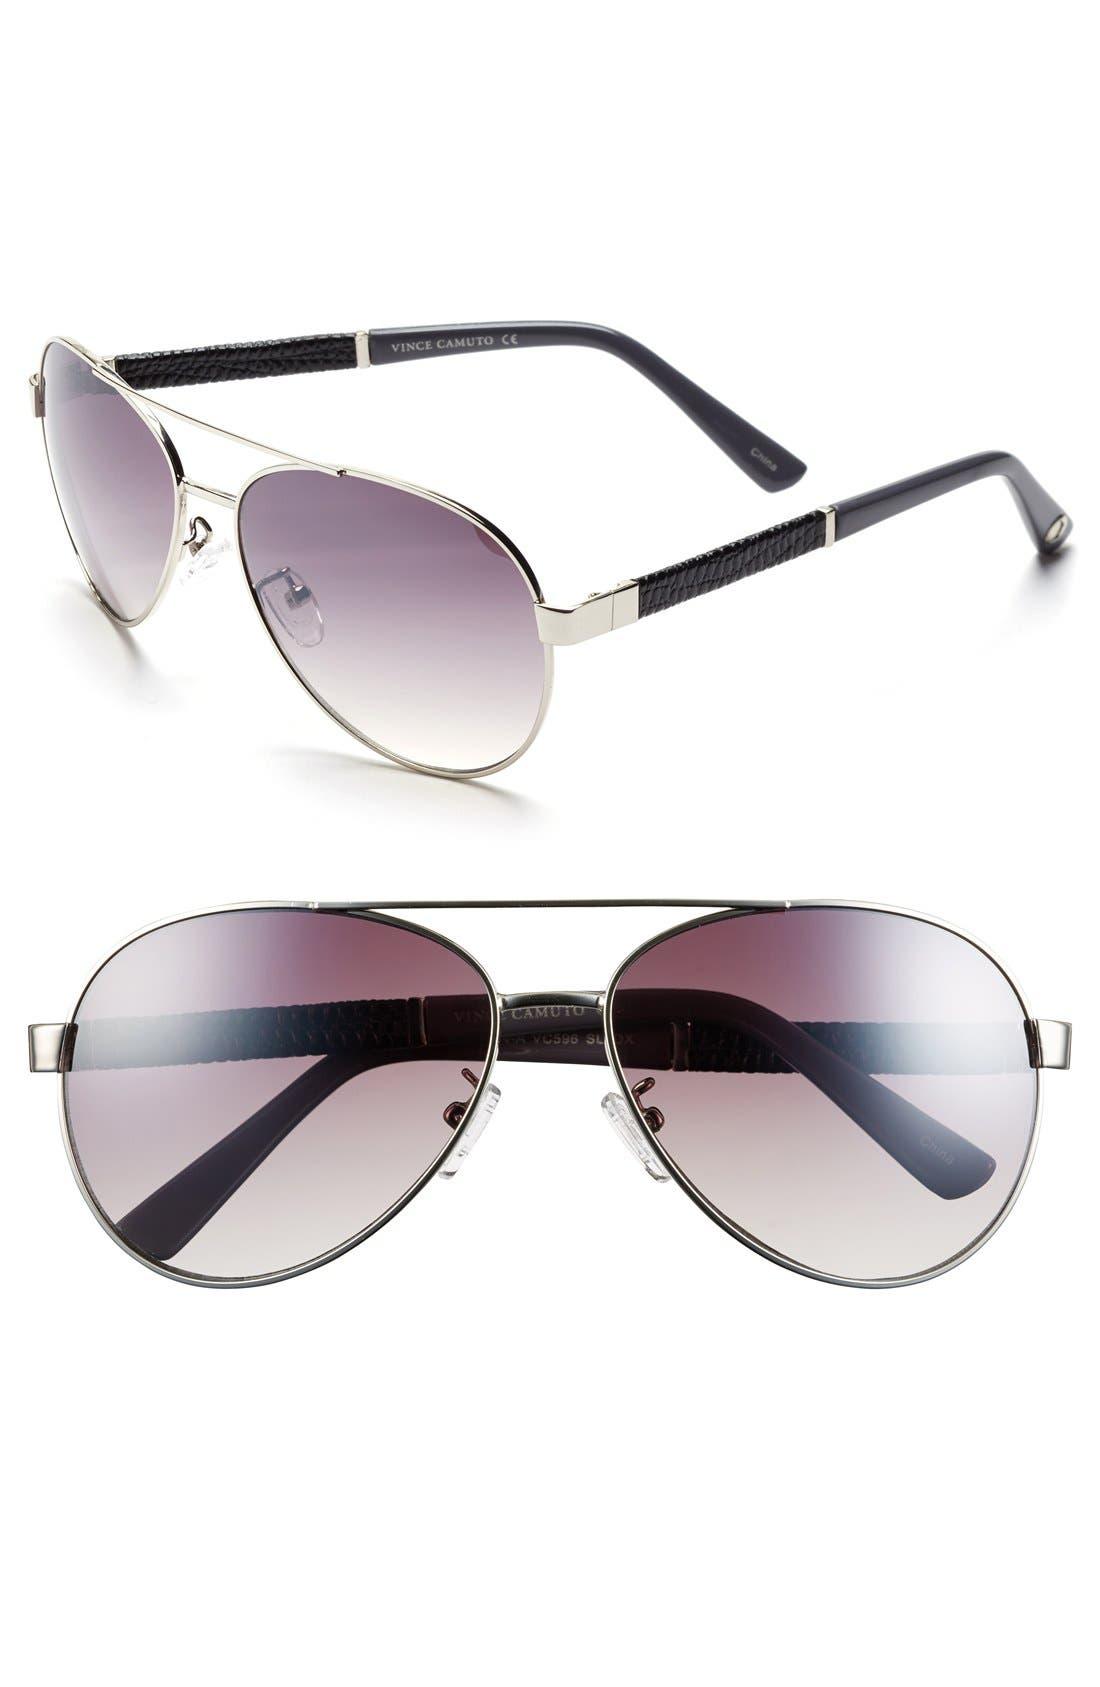 Main Image - Vince Camuto 60mm Aviator Sunglasses